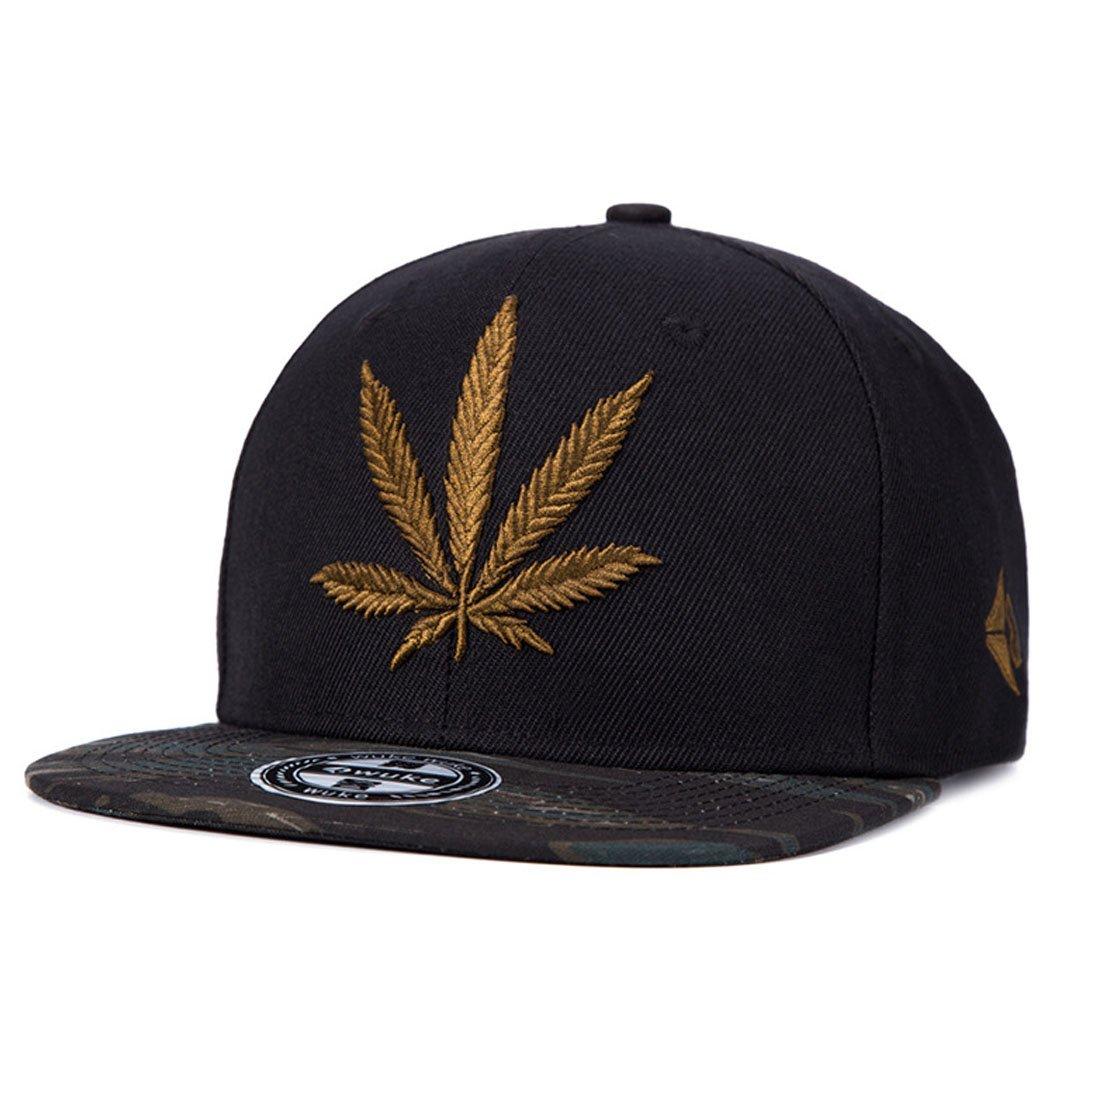 King Star Men Women Leaf Weed Snapback Cannabis Embroidered Flat Bill Baseball Cap Hat